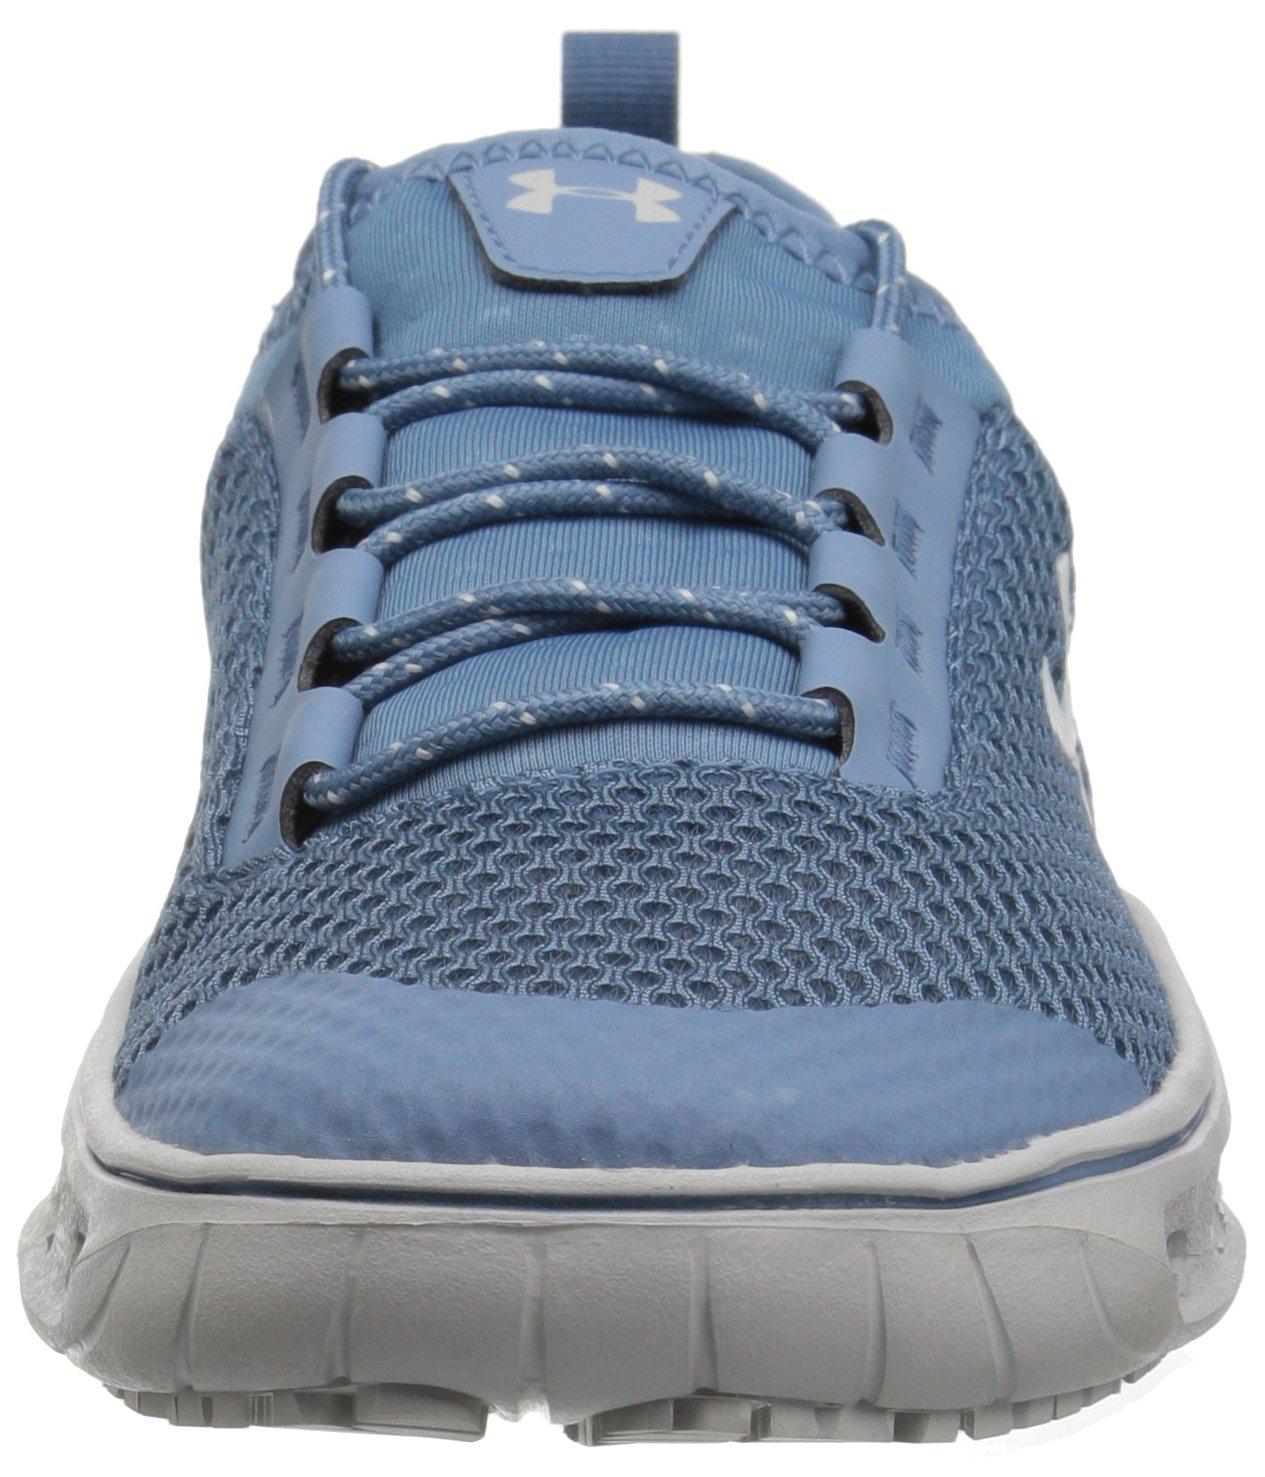 Under Armour Women's M Kilchis Sneaker B071S8FYWX 6 M Women's US Blue 28077c